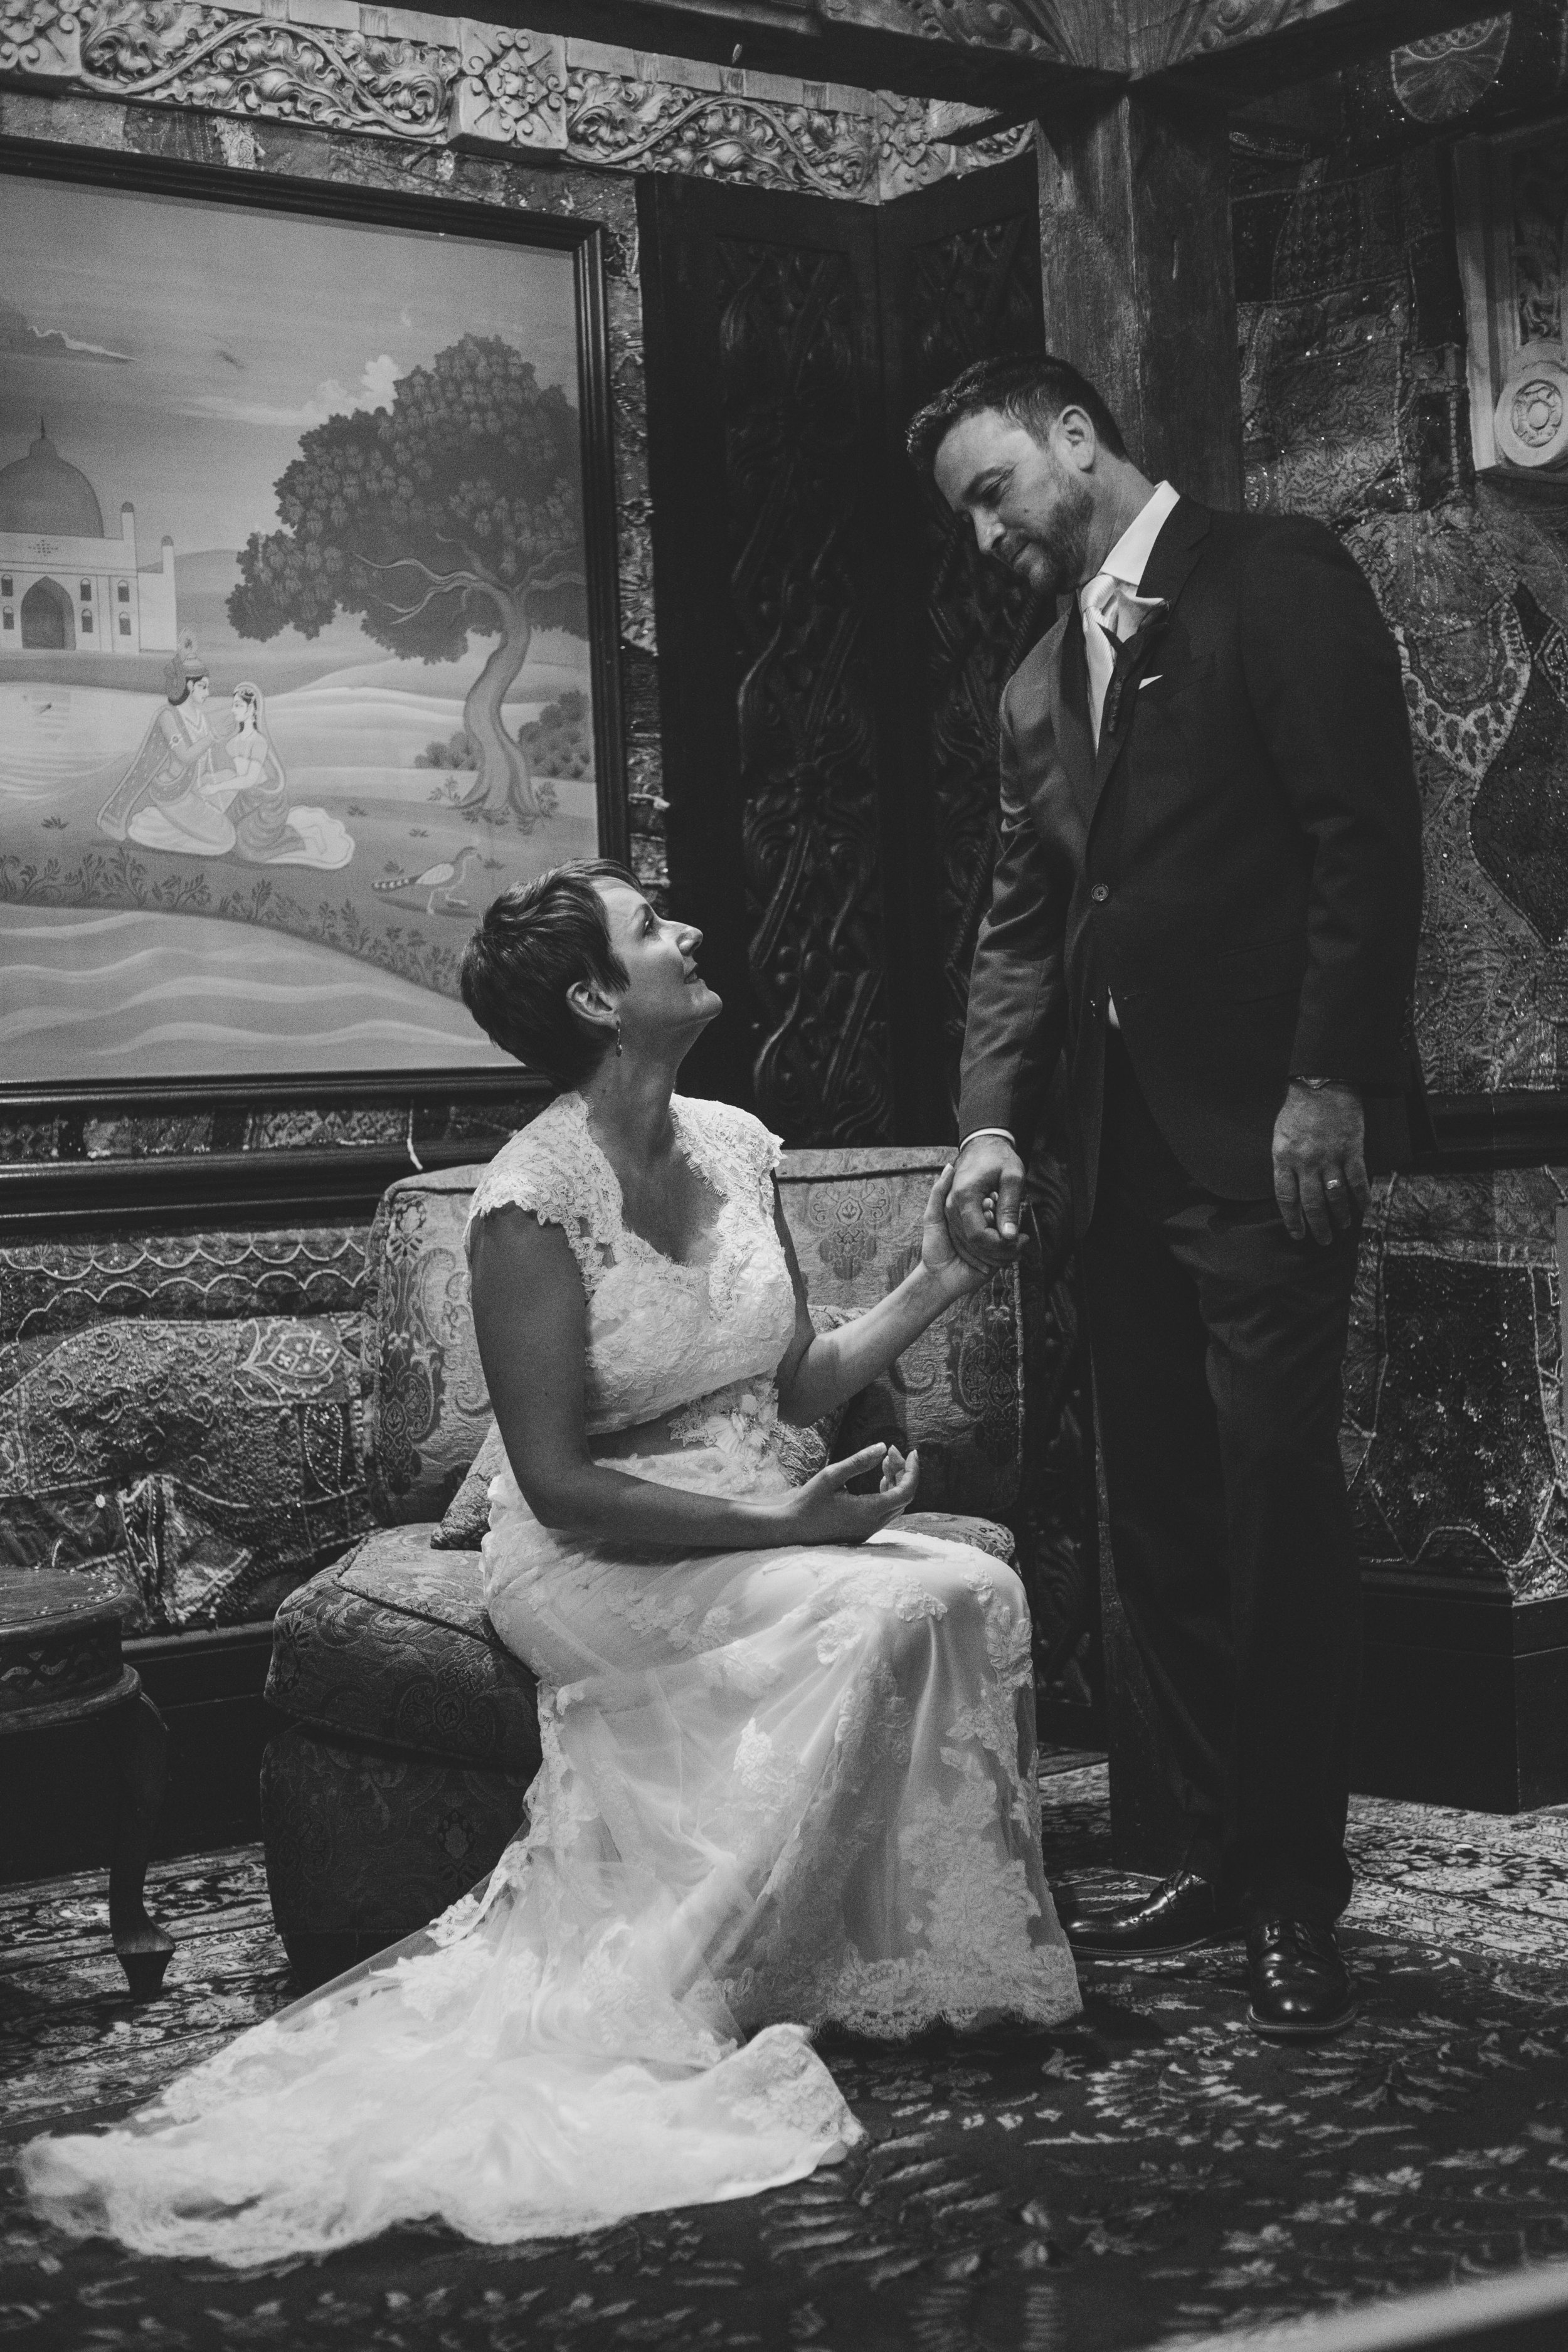 ATGI_Kat and Gabe Wedding 2016_2S8A5395.jpg